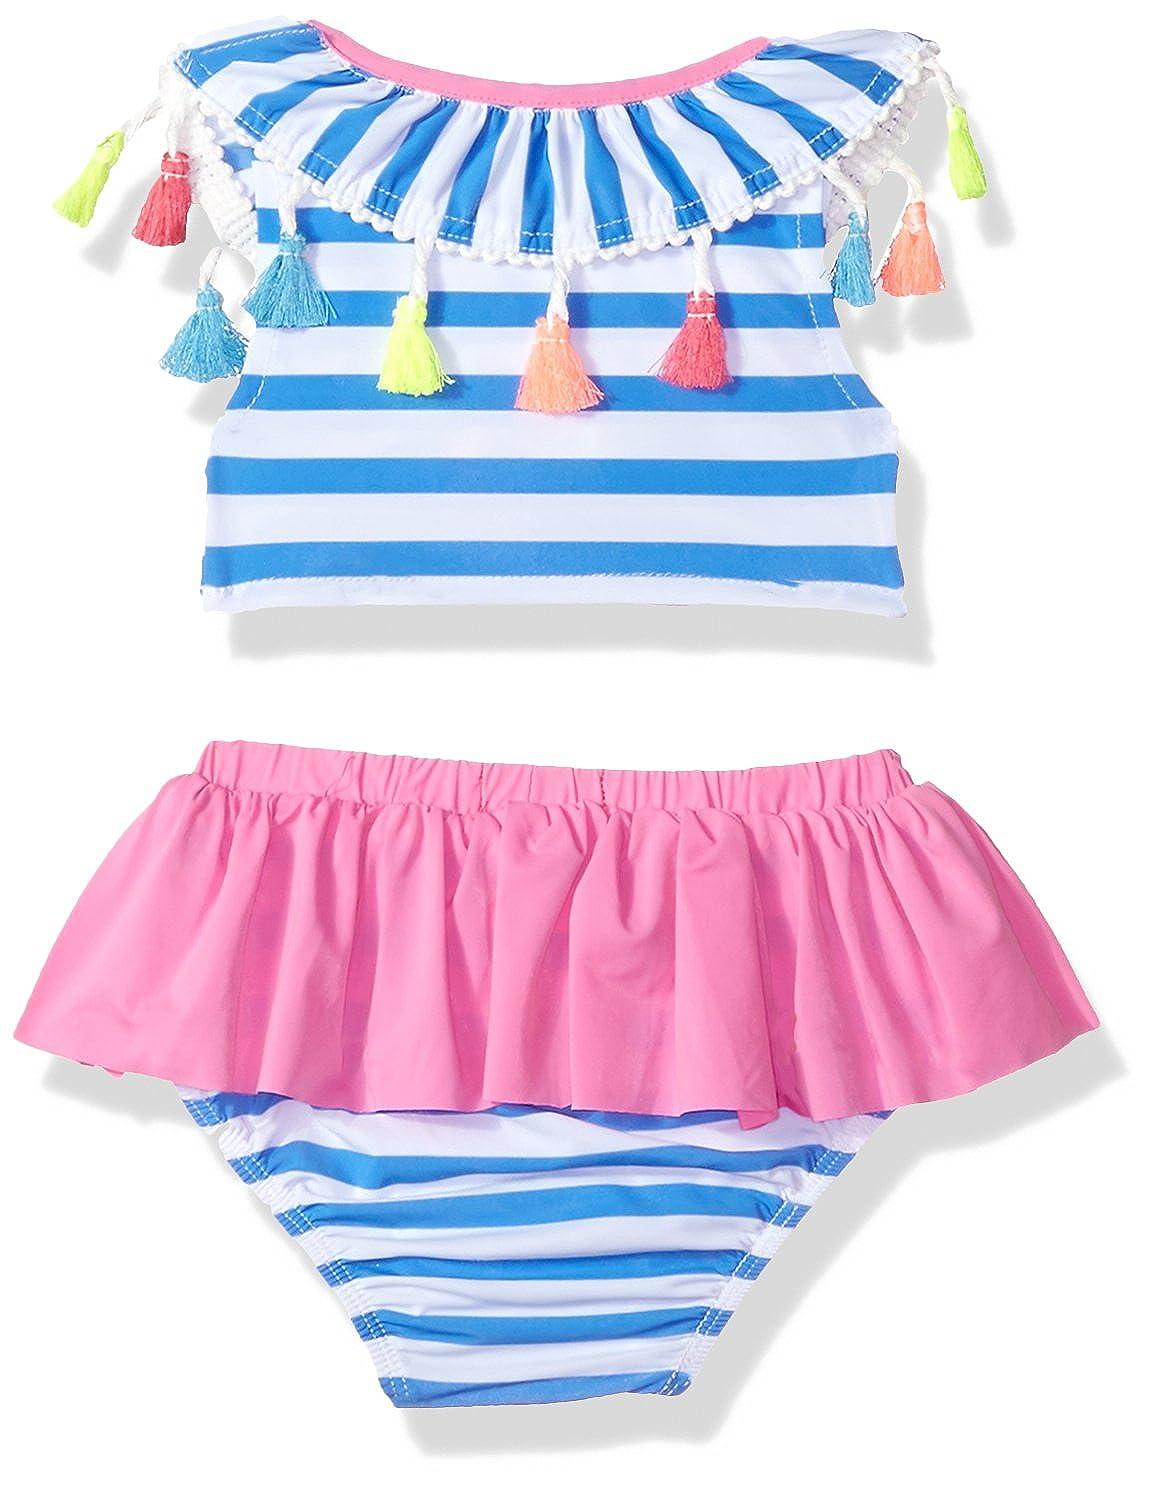 49919131b5 Amazon.com  Mud Pie Girls Tassel Stripe Two Piece Swimsuit  Clothing